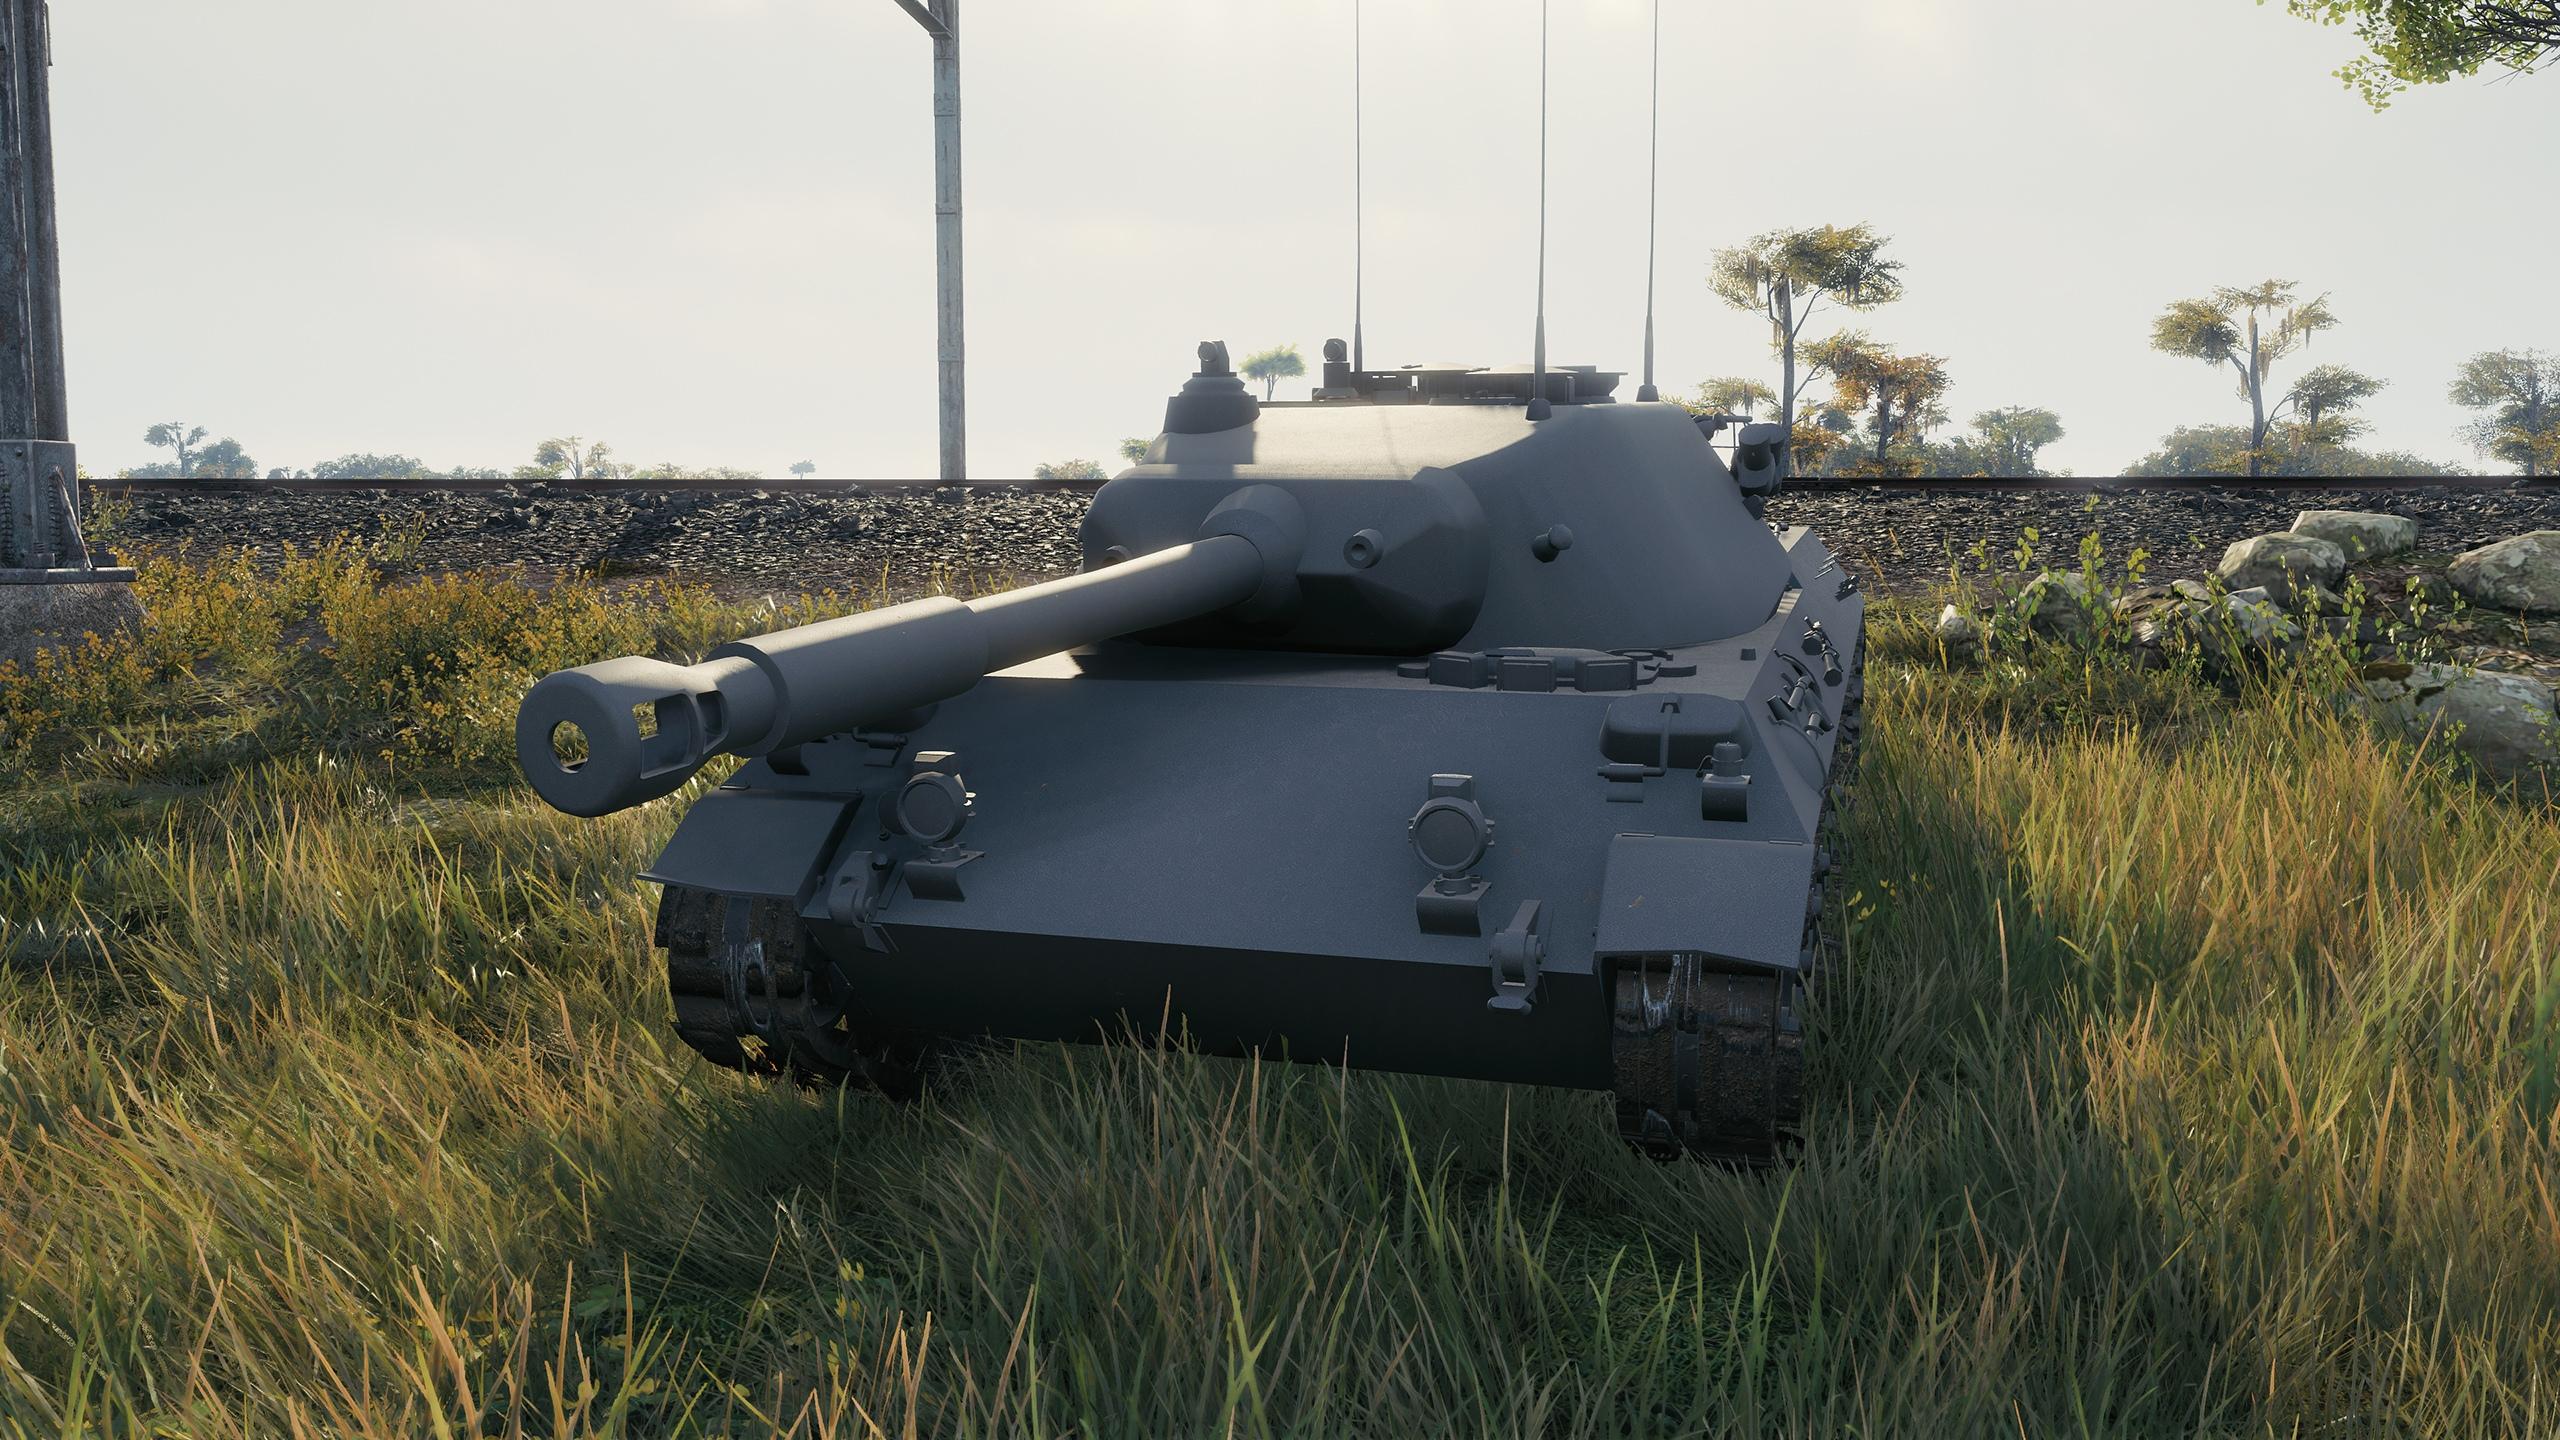 HWK 30 – The Armored Patrol